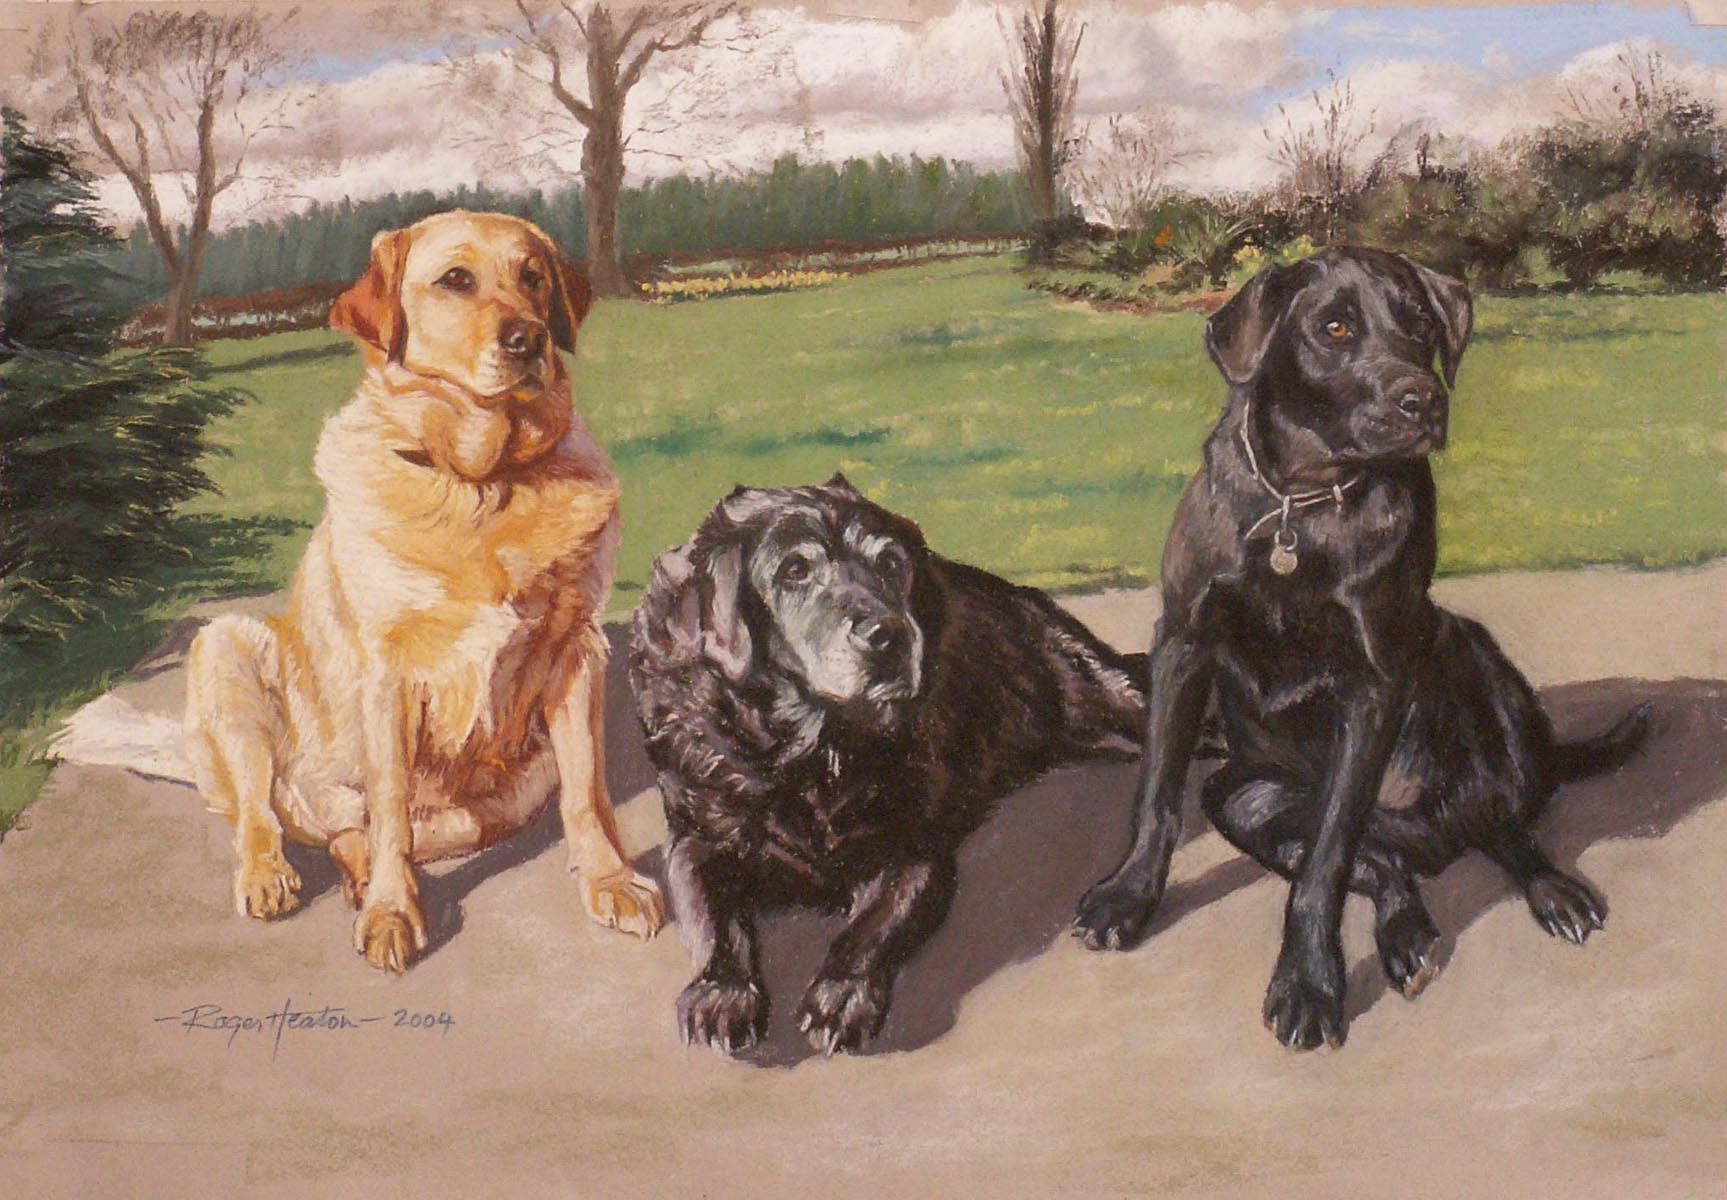 Three generations of Labradors